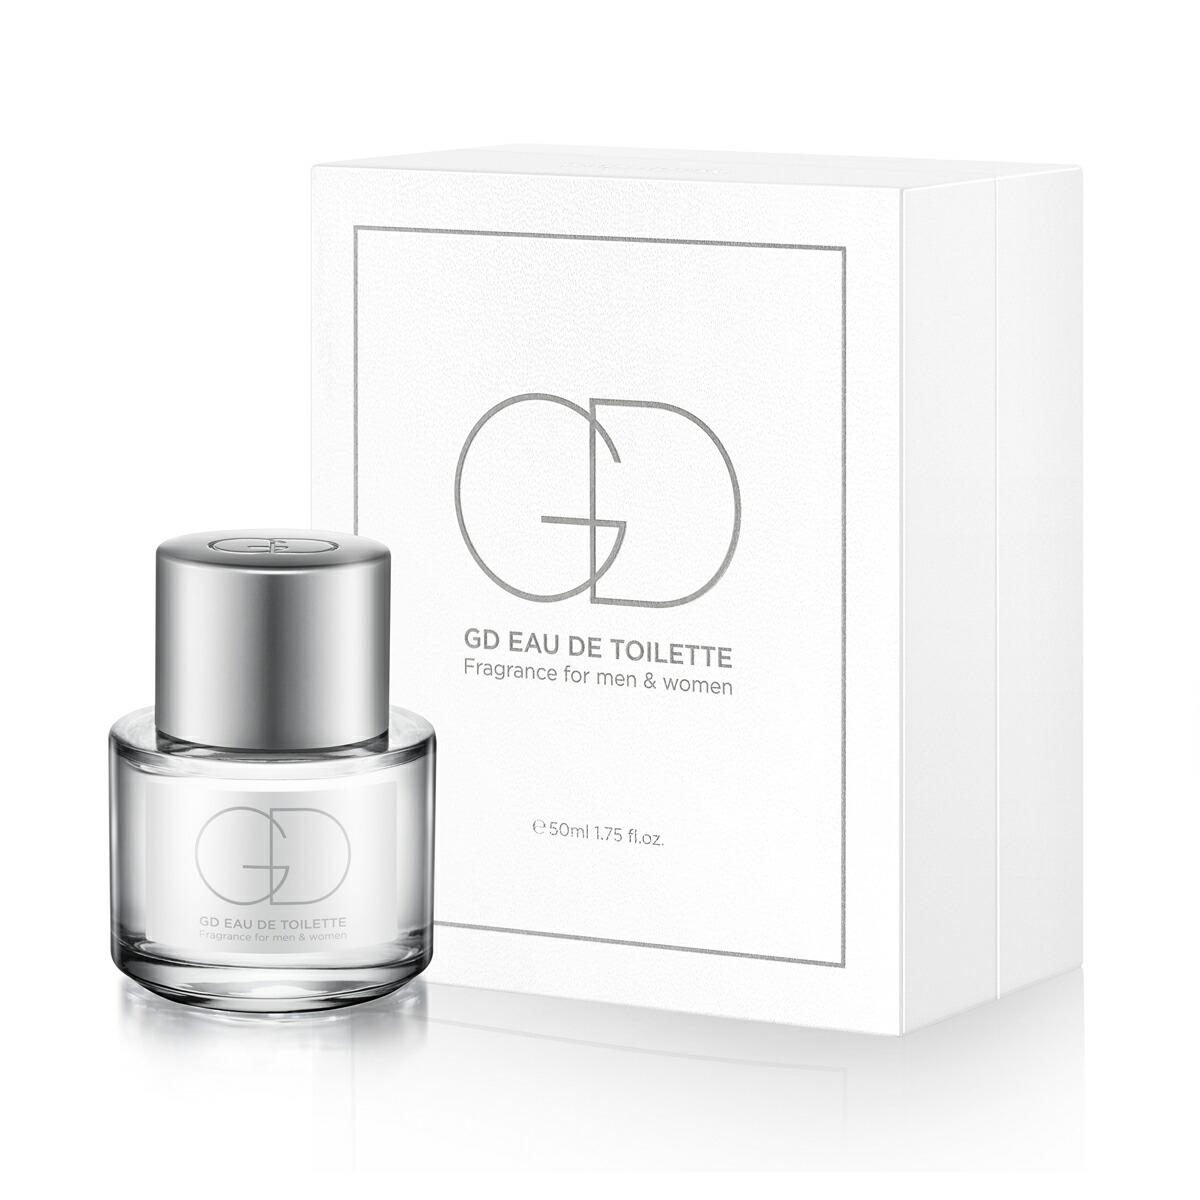 096d9453a SneaK Online Shop: BIGBANG goods G-DRAGON perfume eau de toilette ...